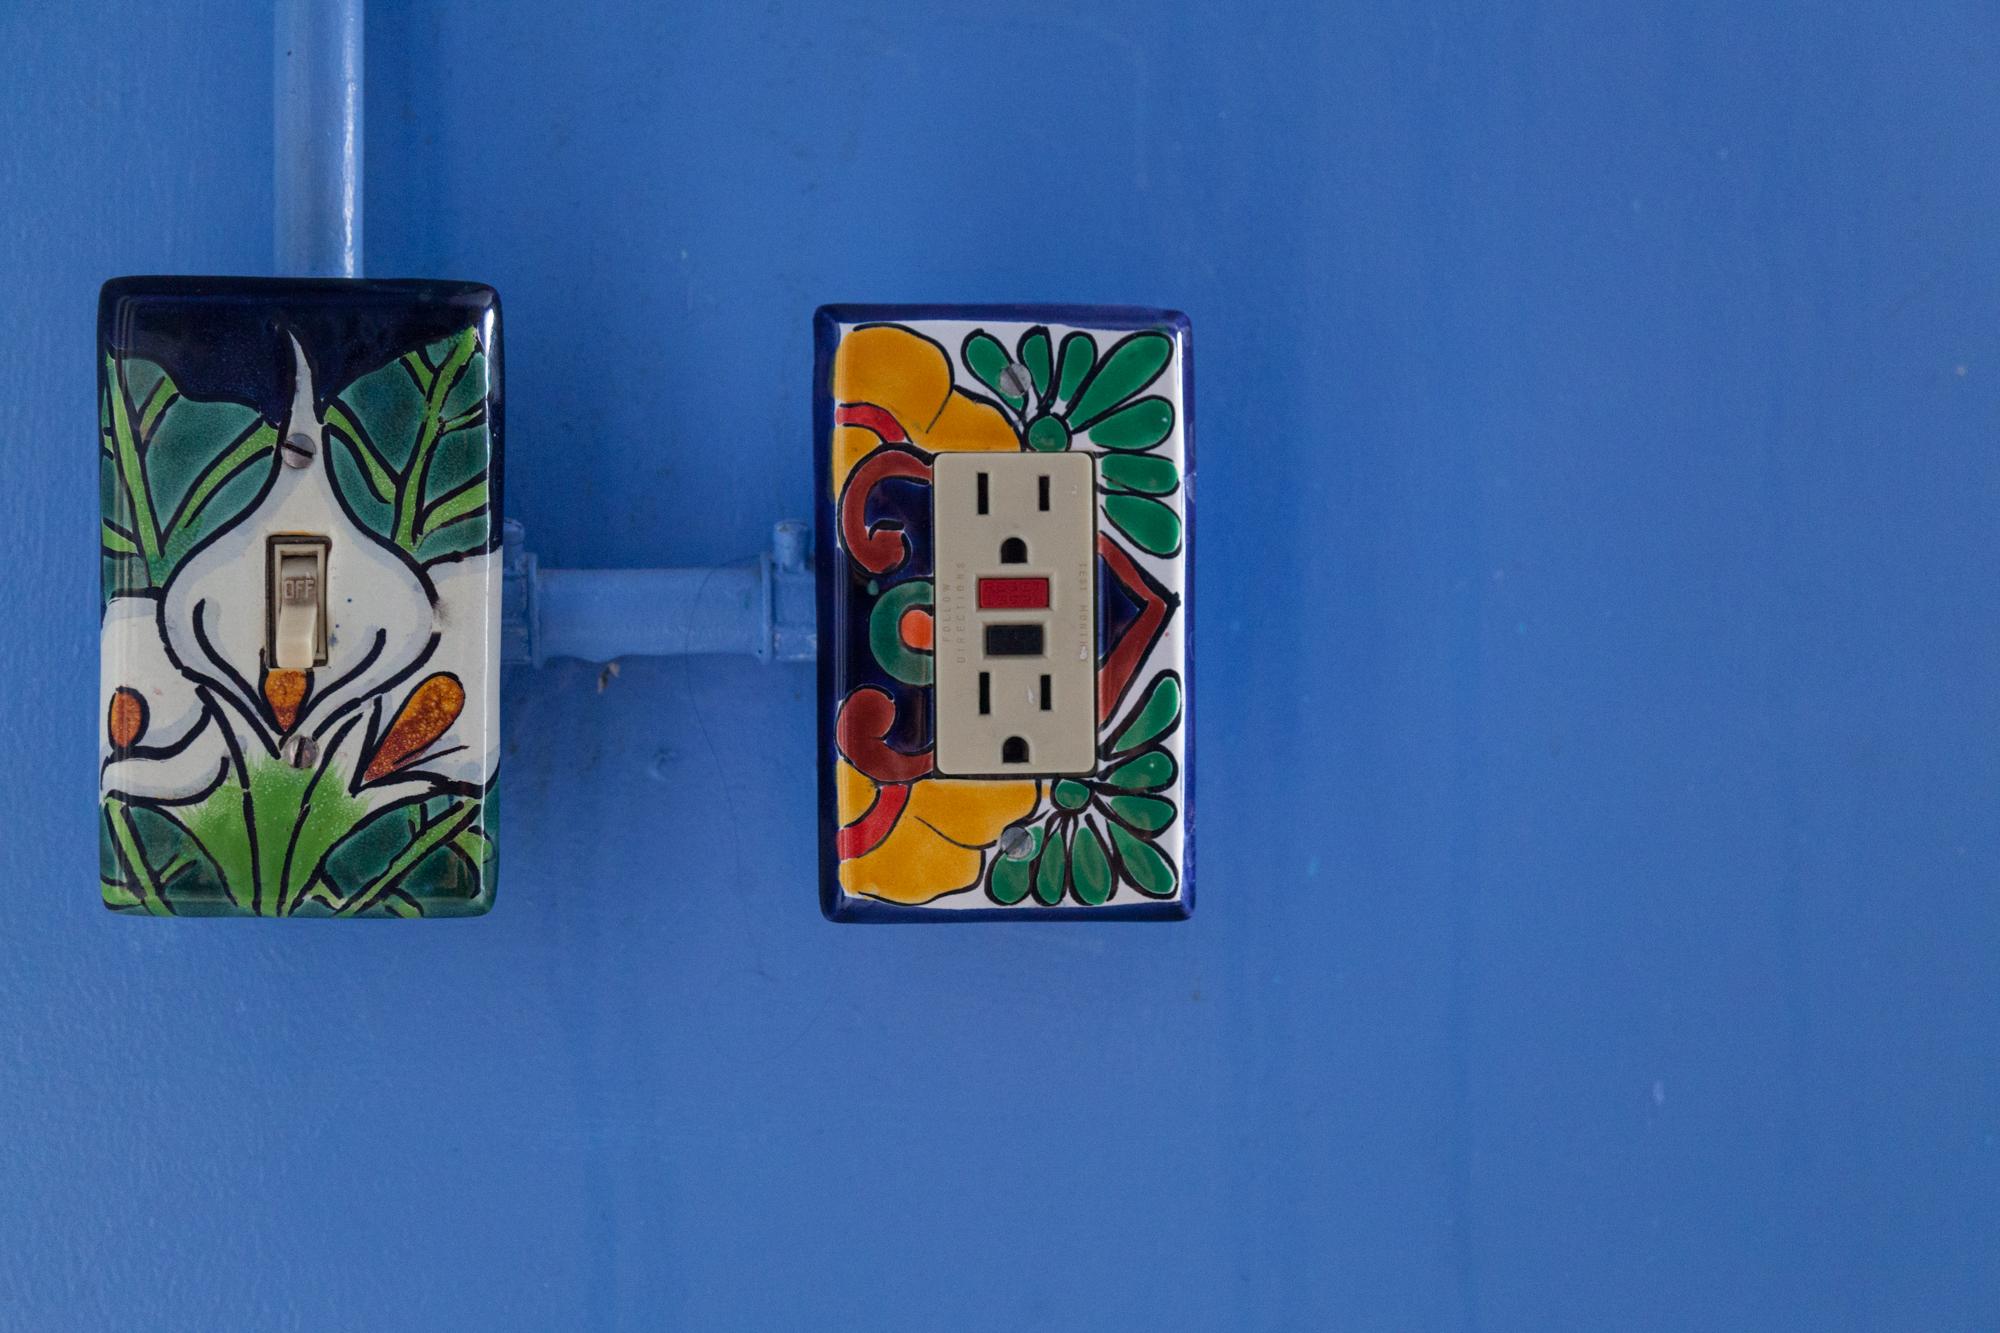 08-Bathroom-0002-Summer_Rayne_Oakes-Talavera-Light-Switches.jpg